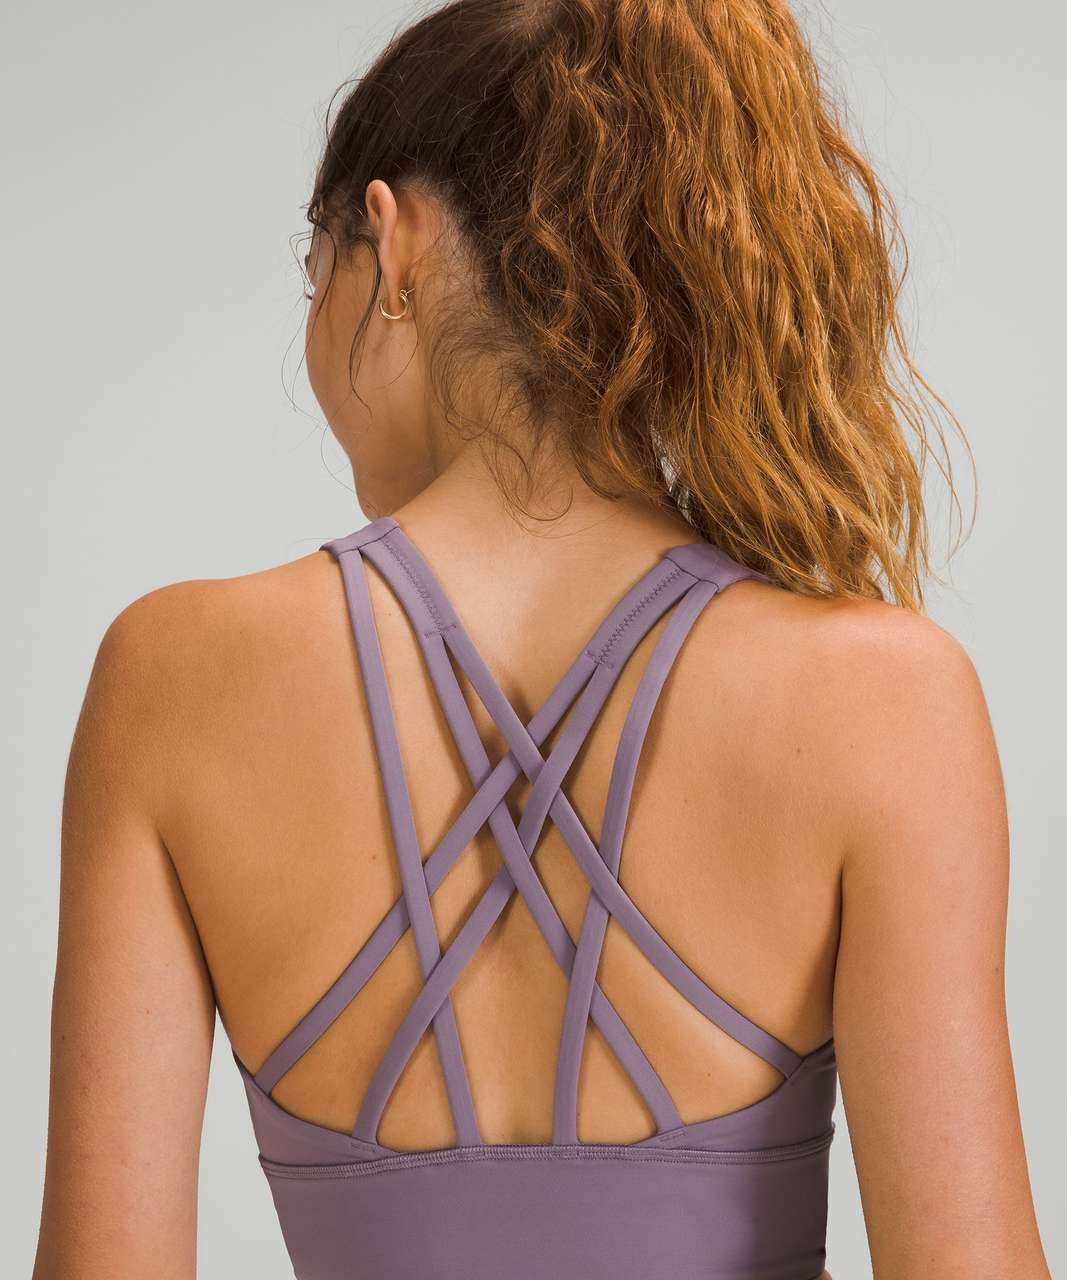 Lululemon Free to Be Serene Bra Longline *Light Support, C/D Cup - Dusky Lavender